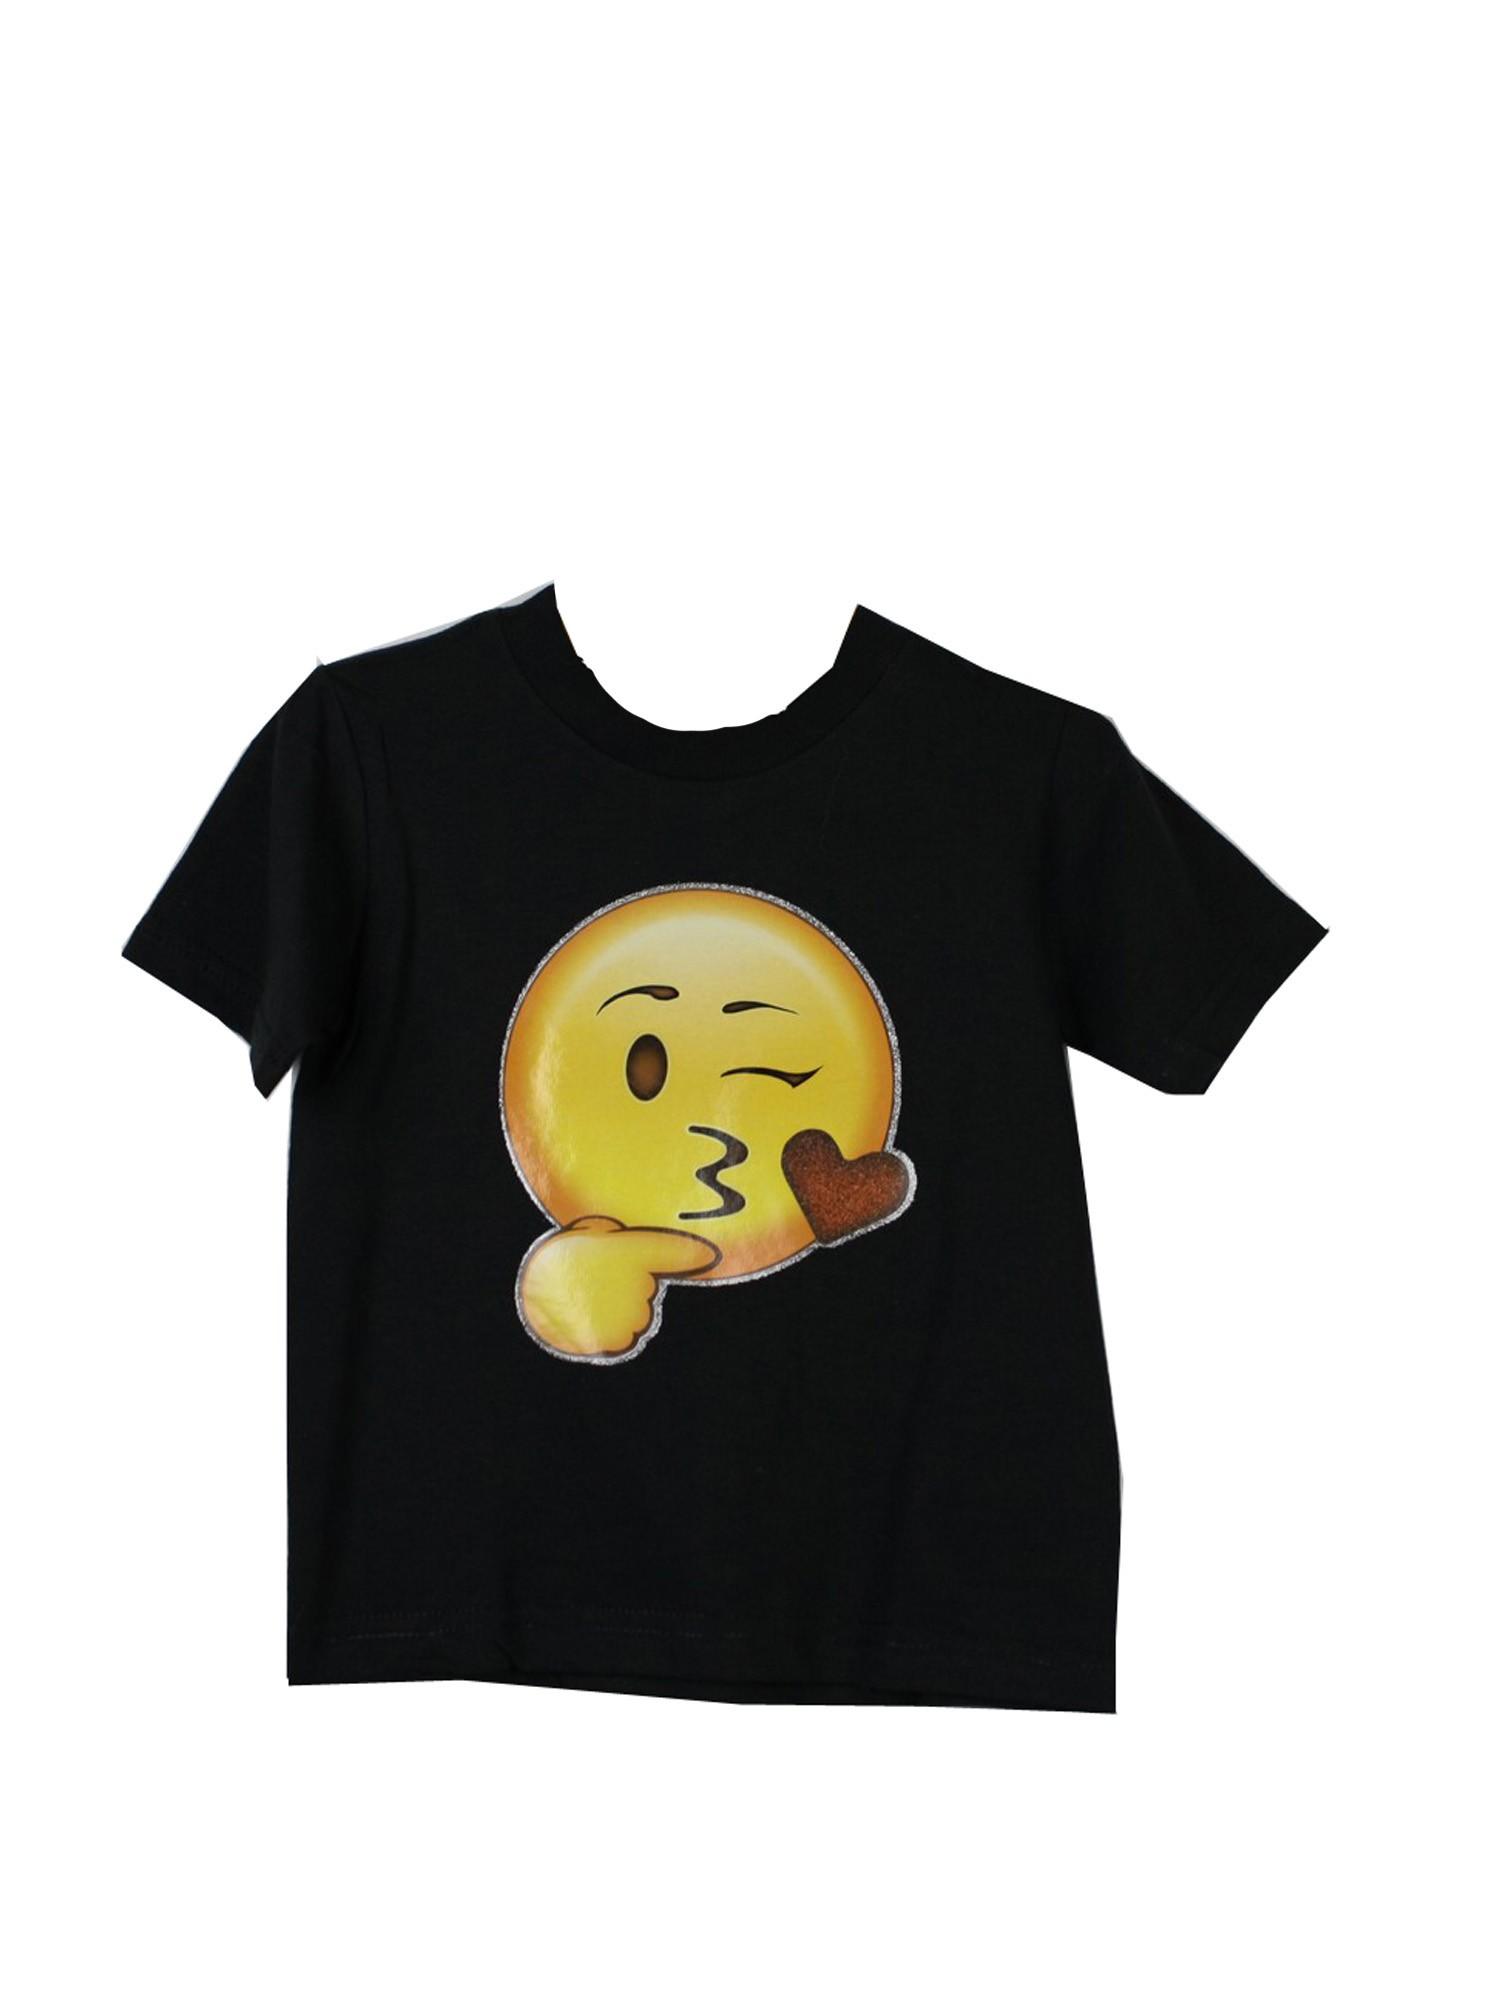 Unisex Black Yellow Blow Kiss Emoji Face Print Cotton Trendy T-Shirt